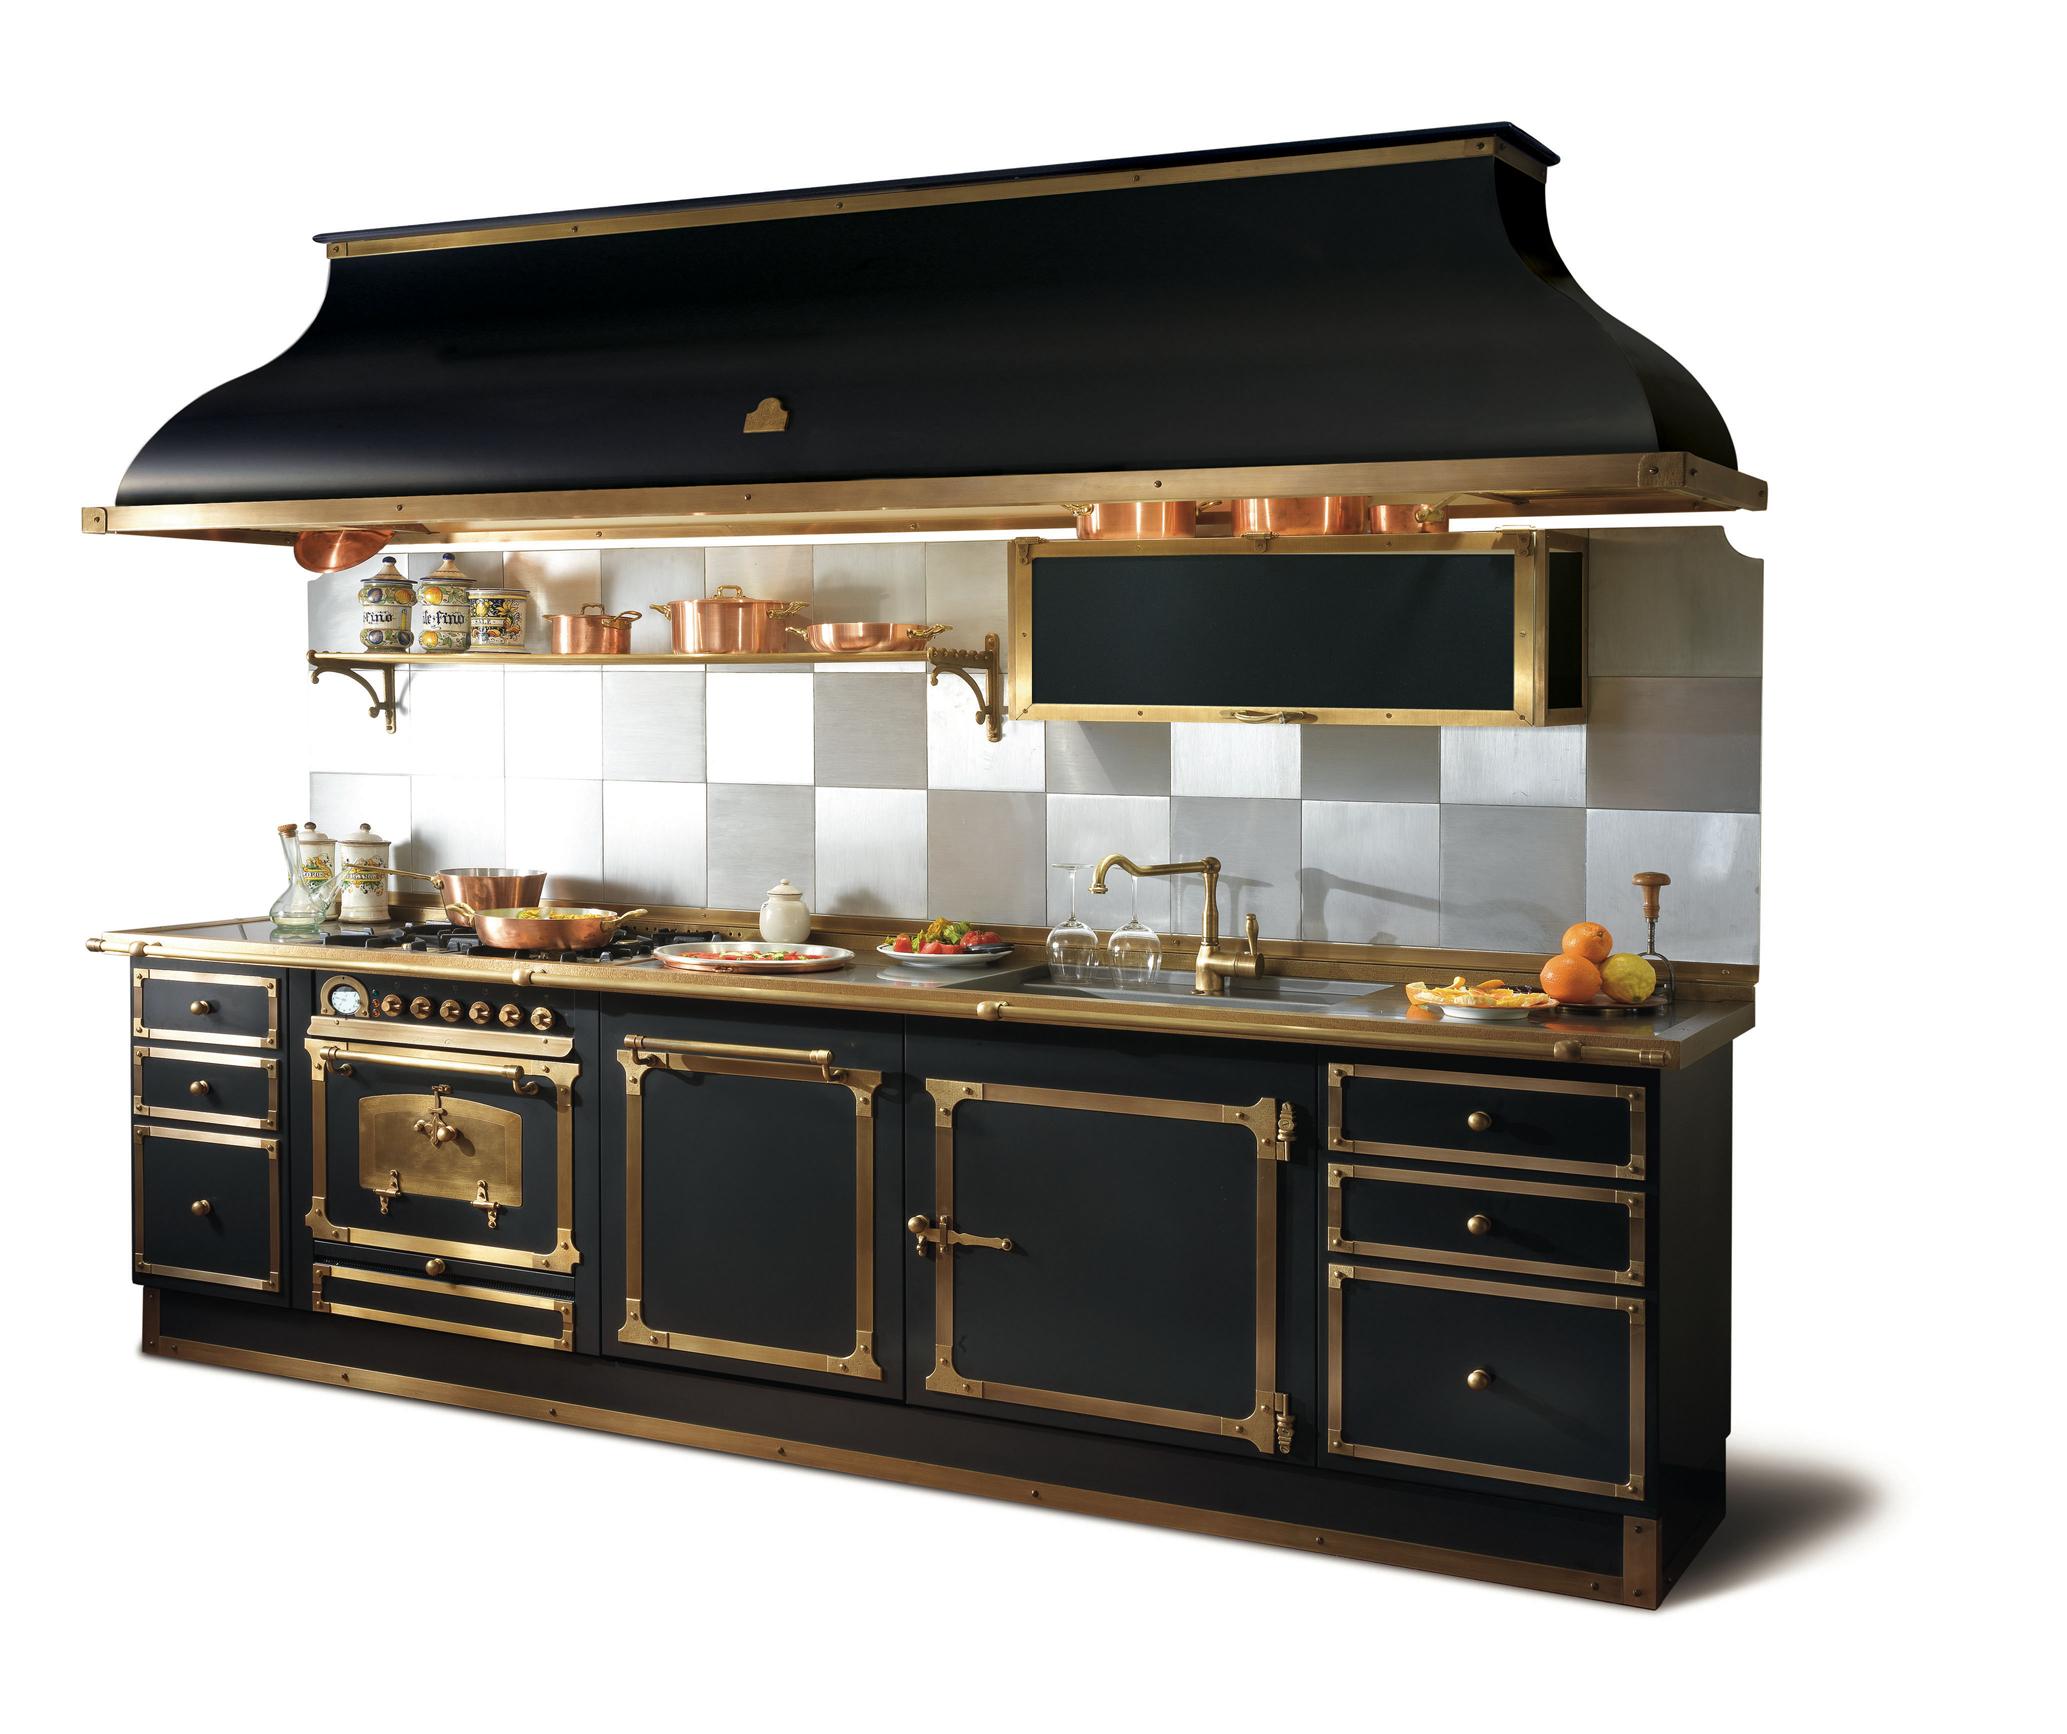 Restart cucine ad eurocucina salone 2012 arredativo for Cucine salone del mobile